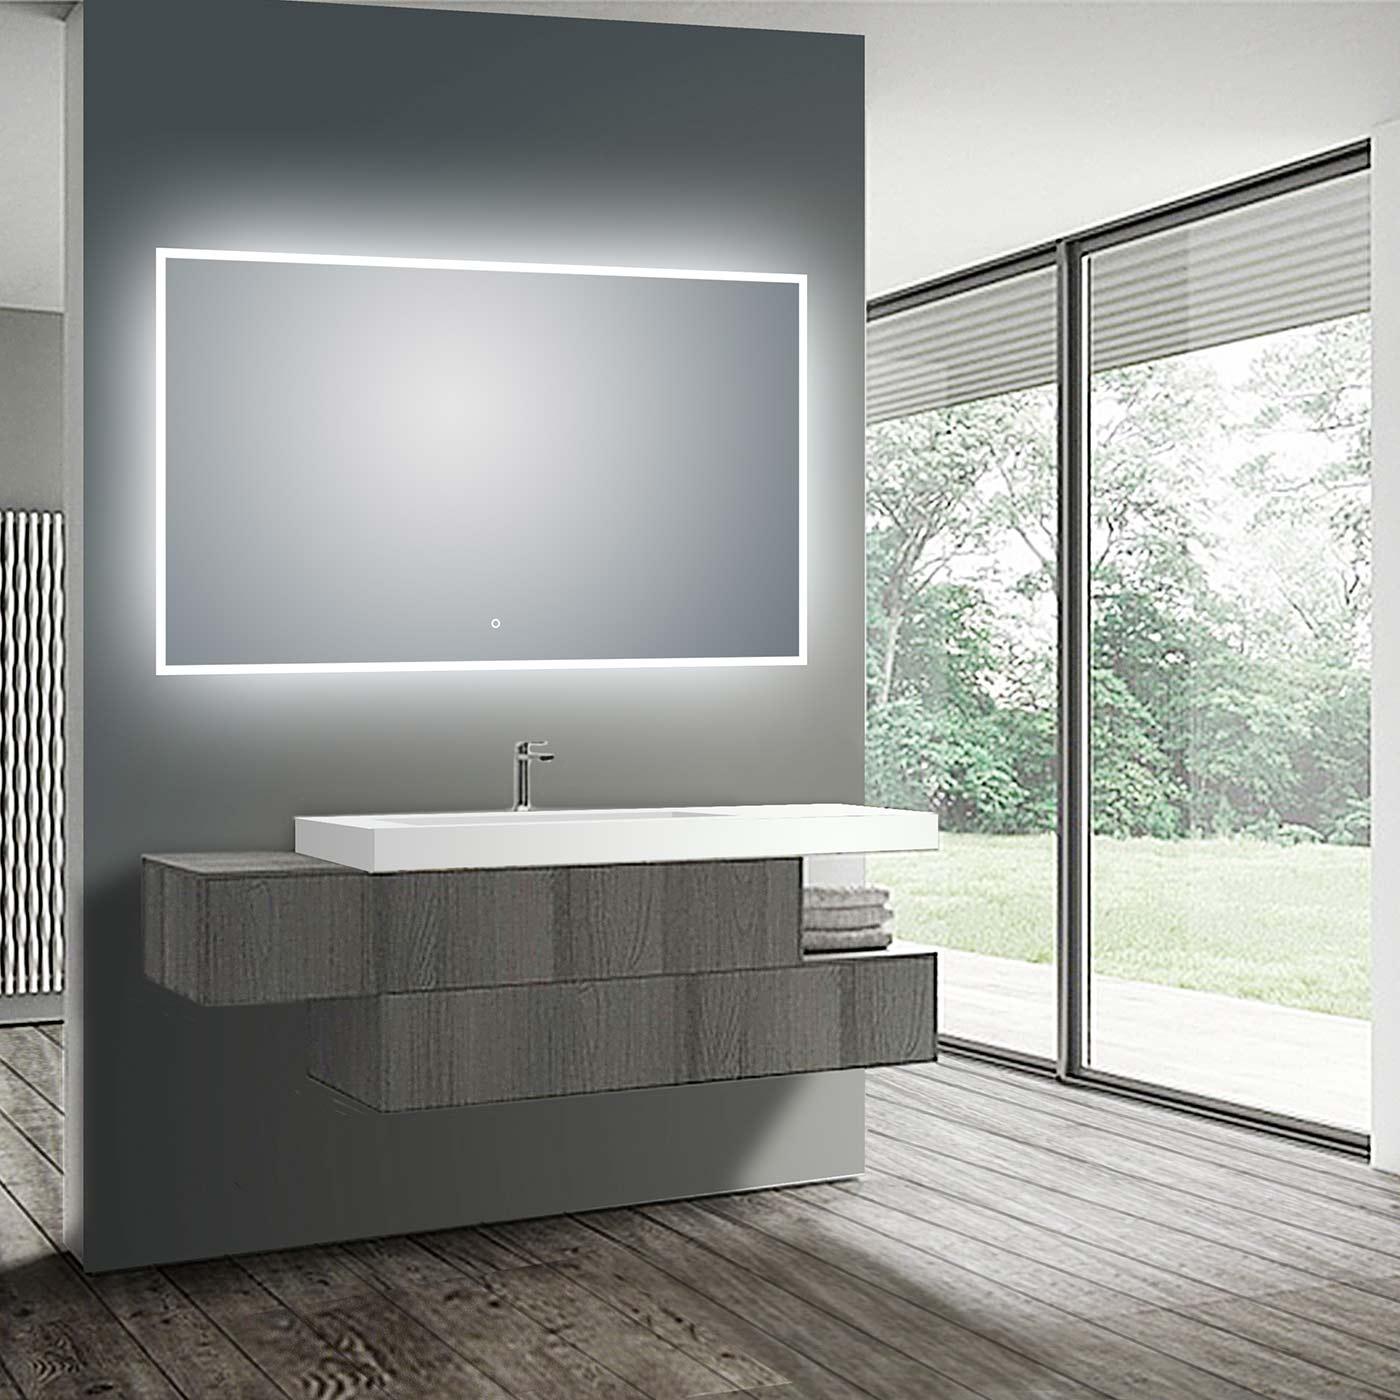 Buy 59 IN X 36 INCH LED Illuminated Bathroom / Vanity Wall ...